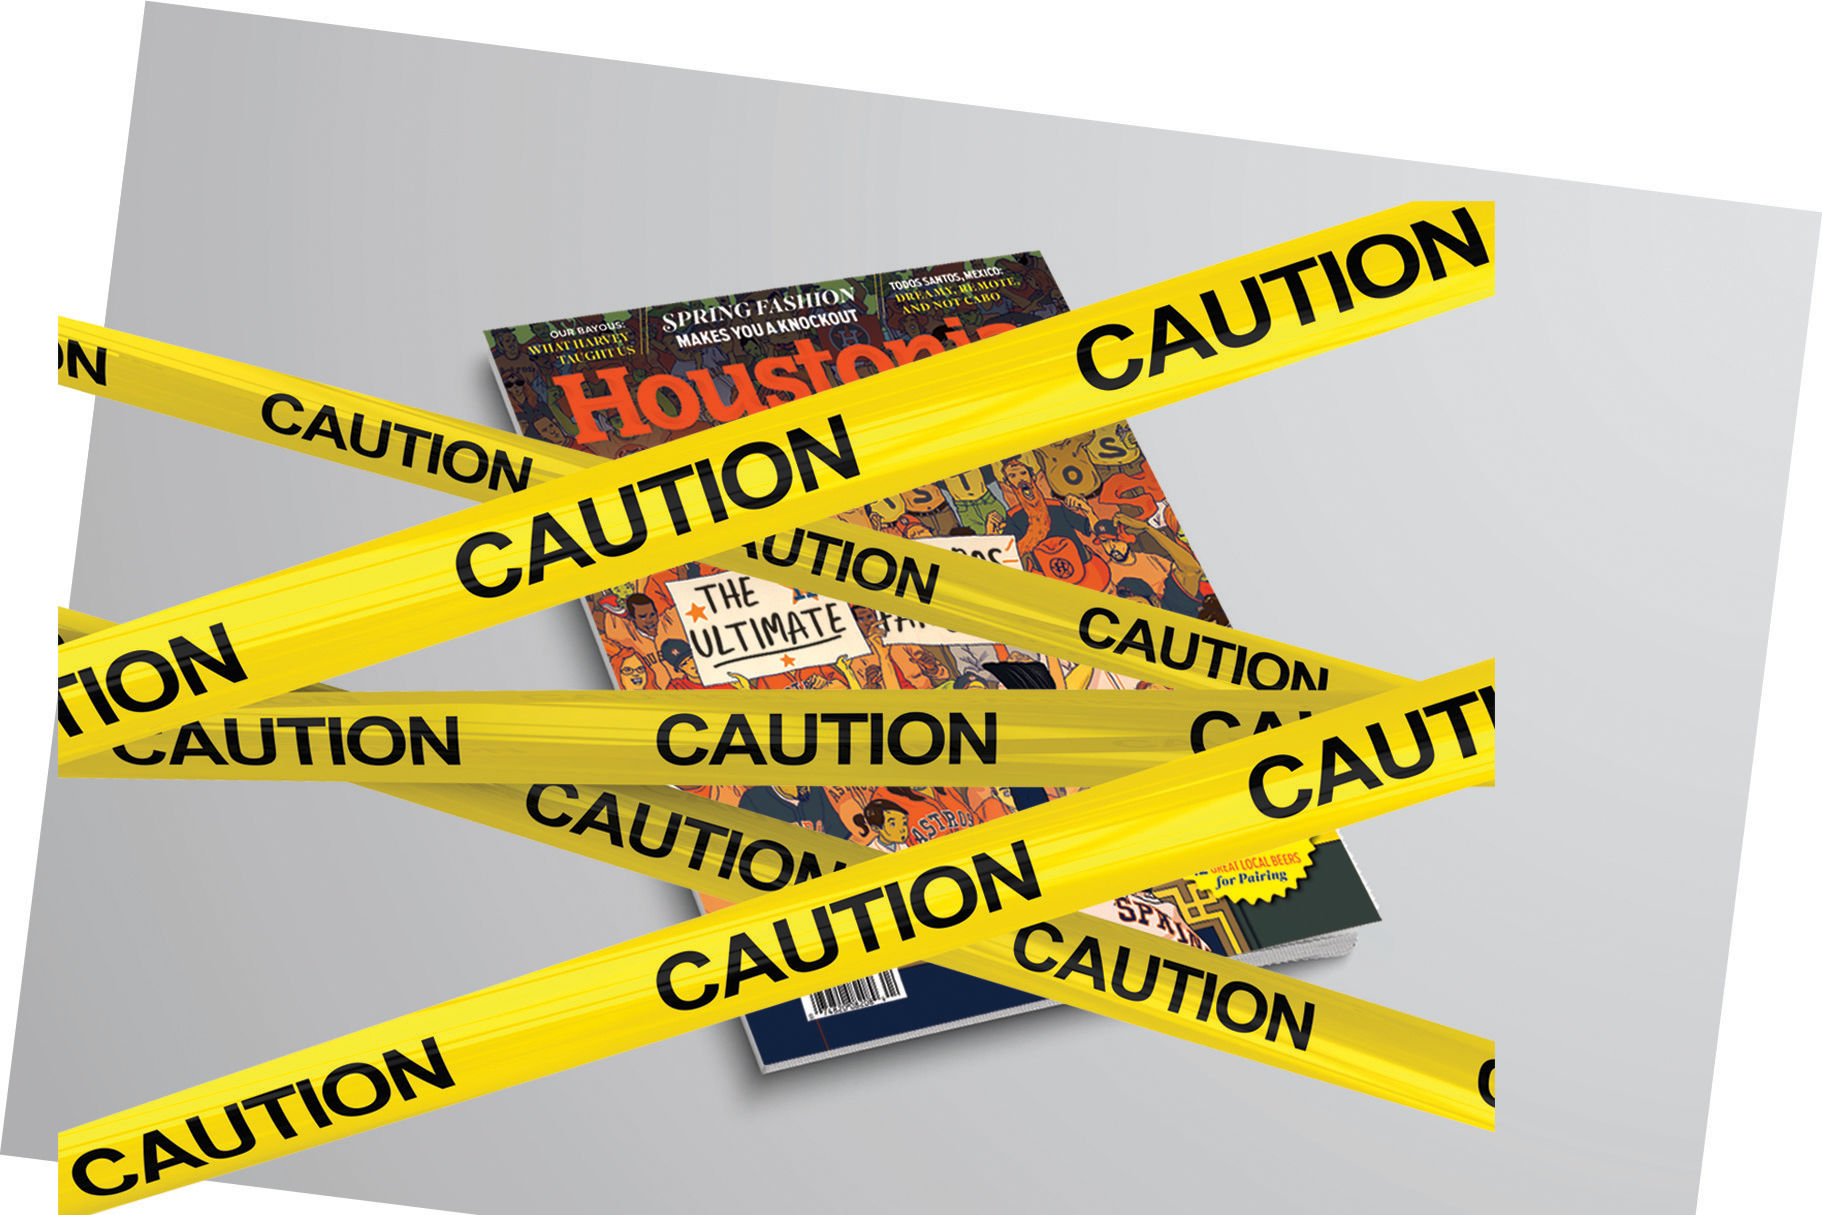 Caution ln1uvb